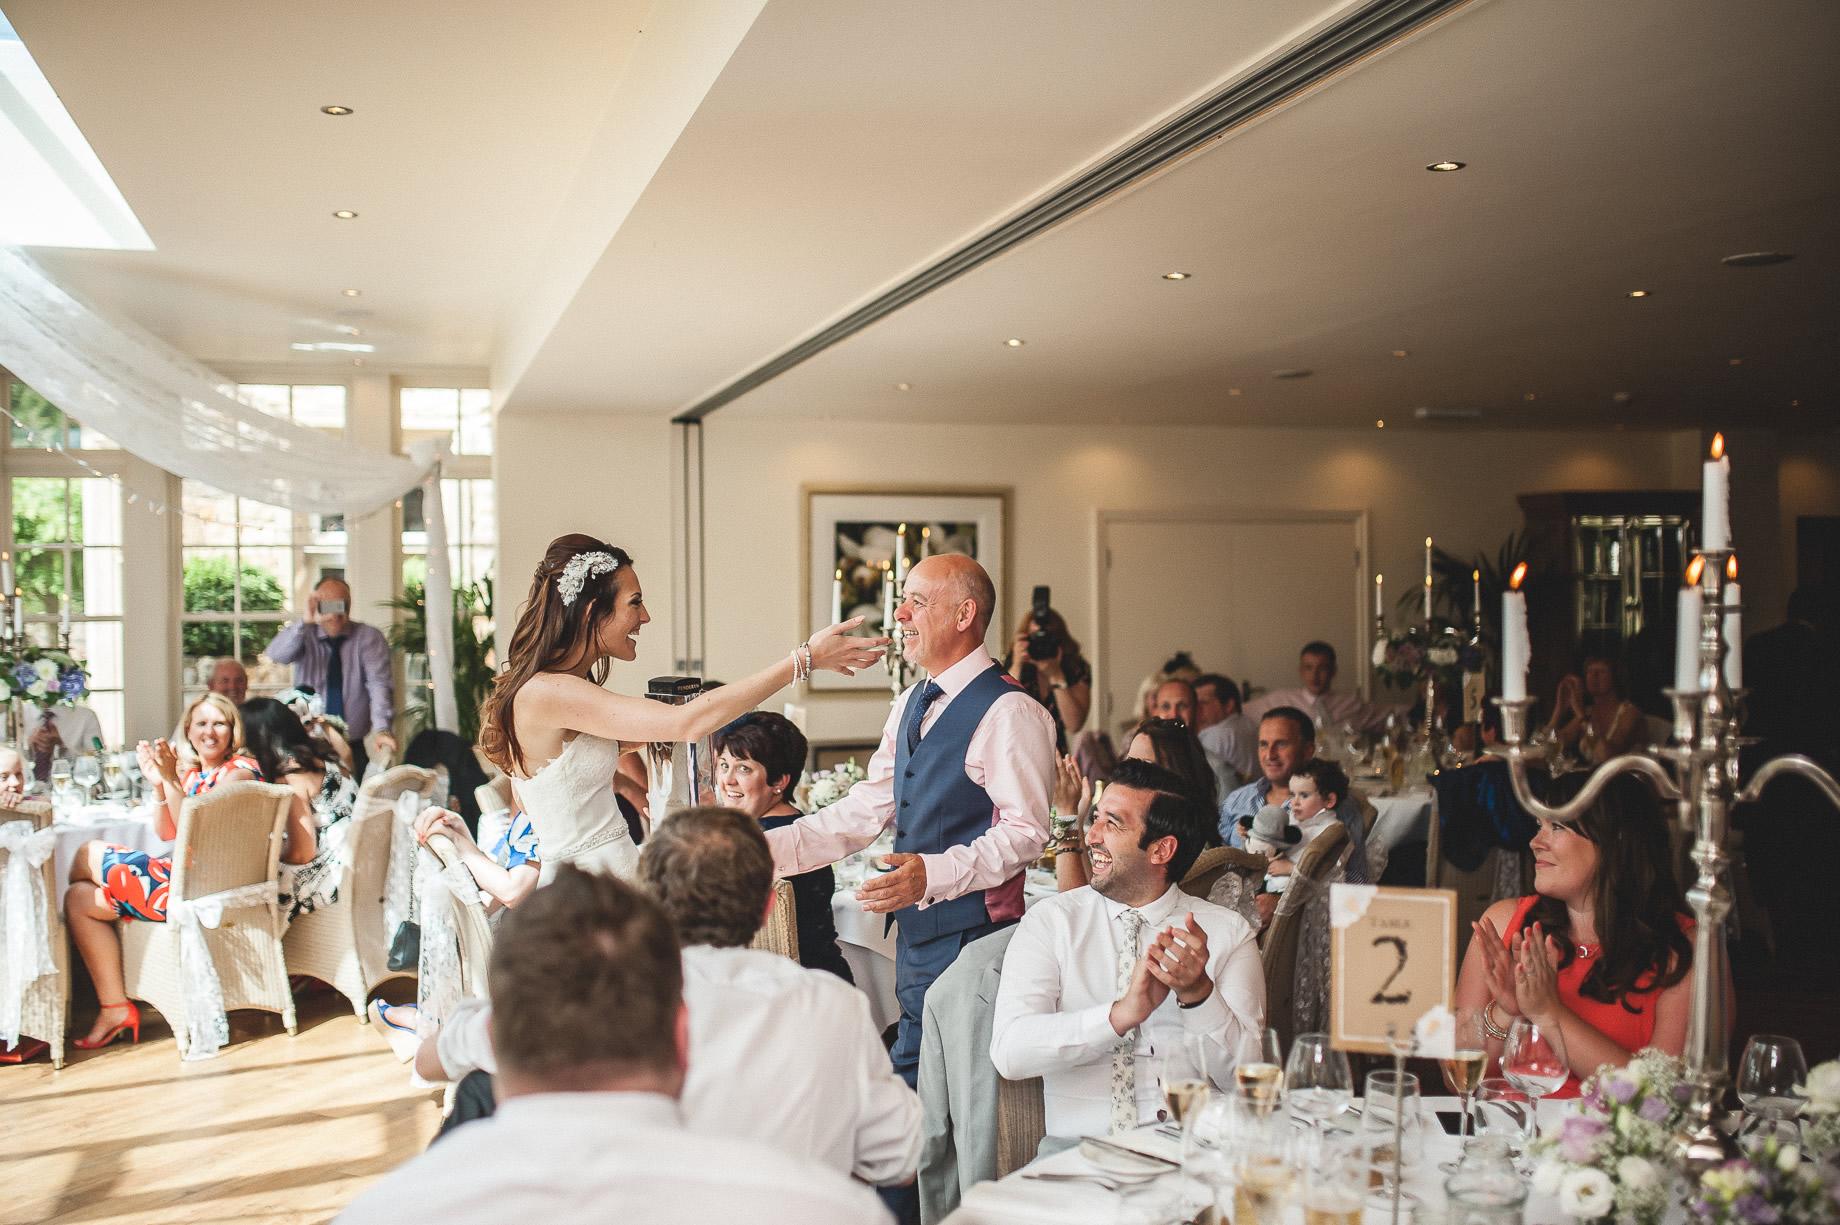 Helen and Matt's Wedding at Mitton Hall 092